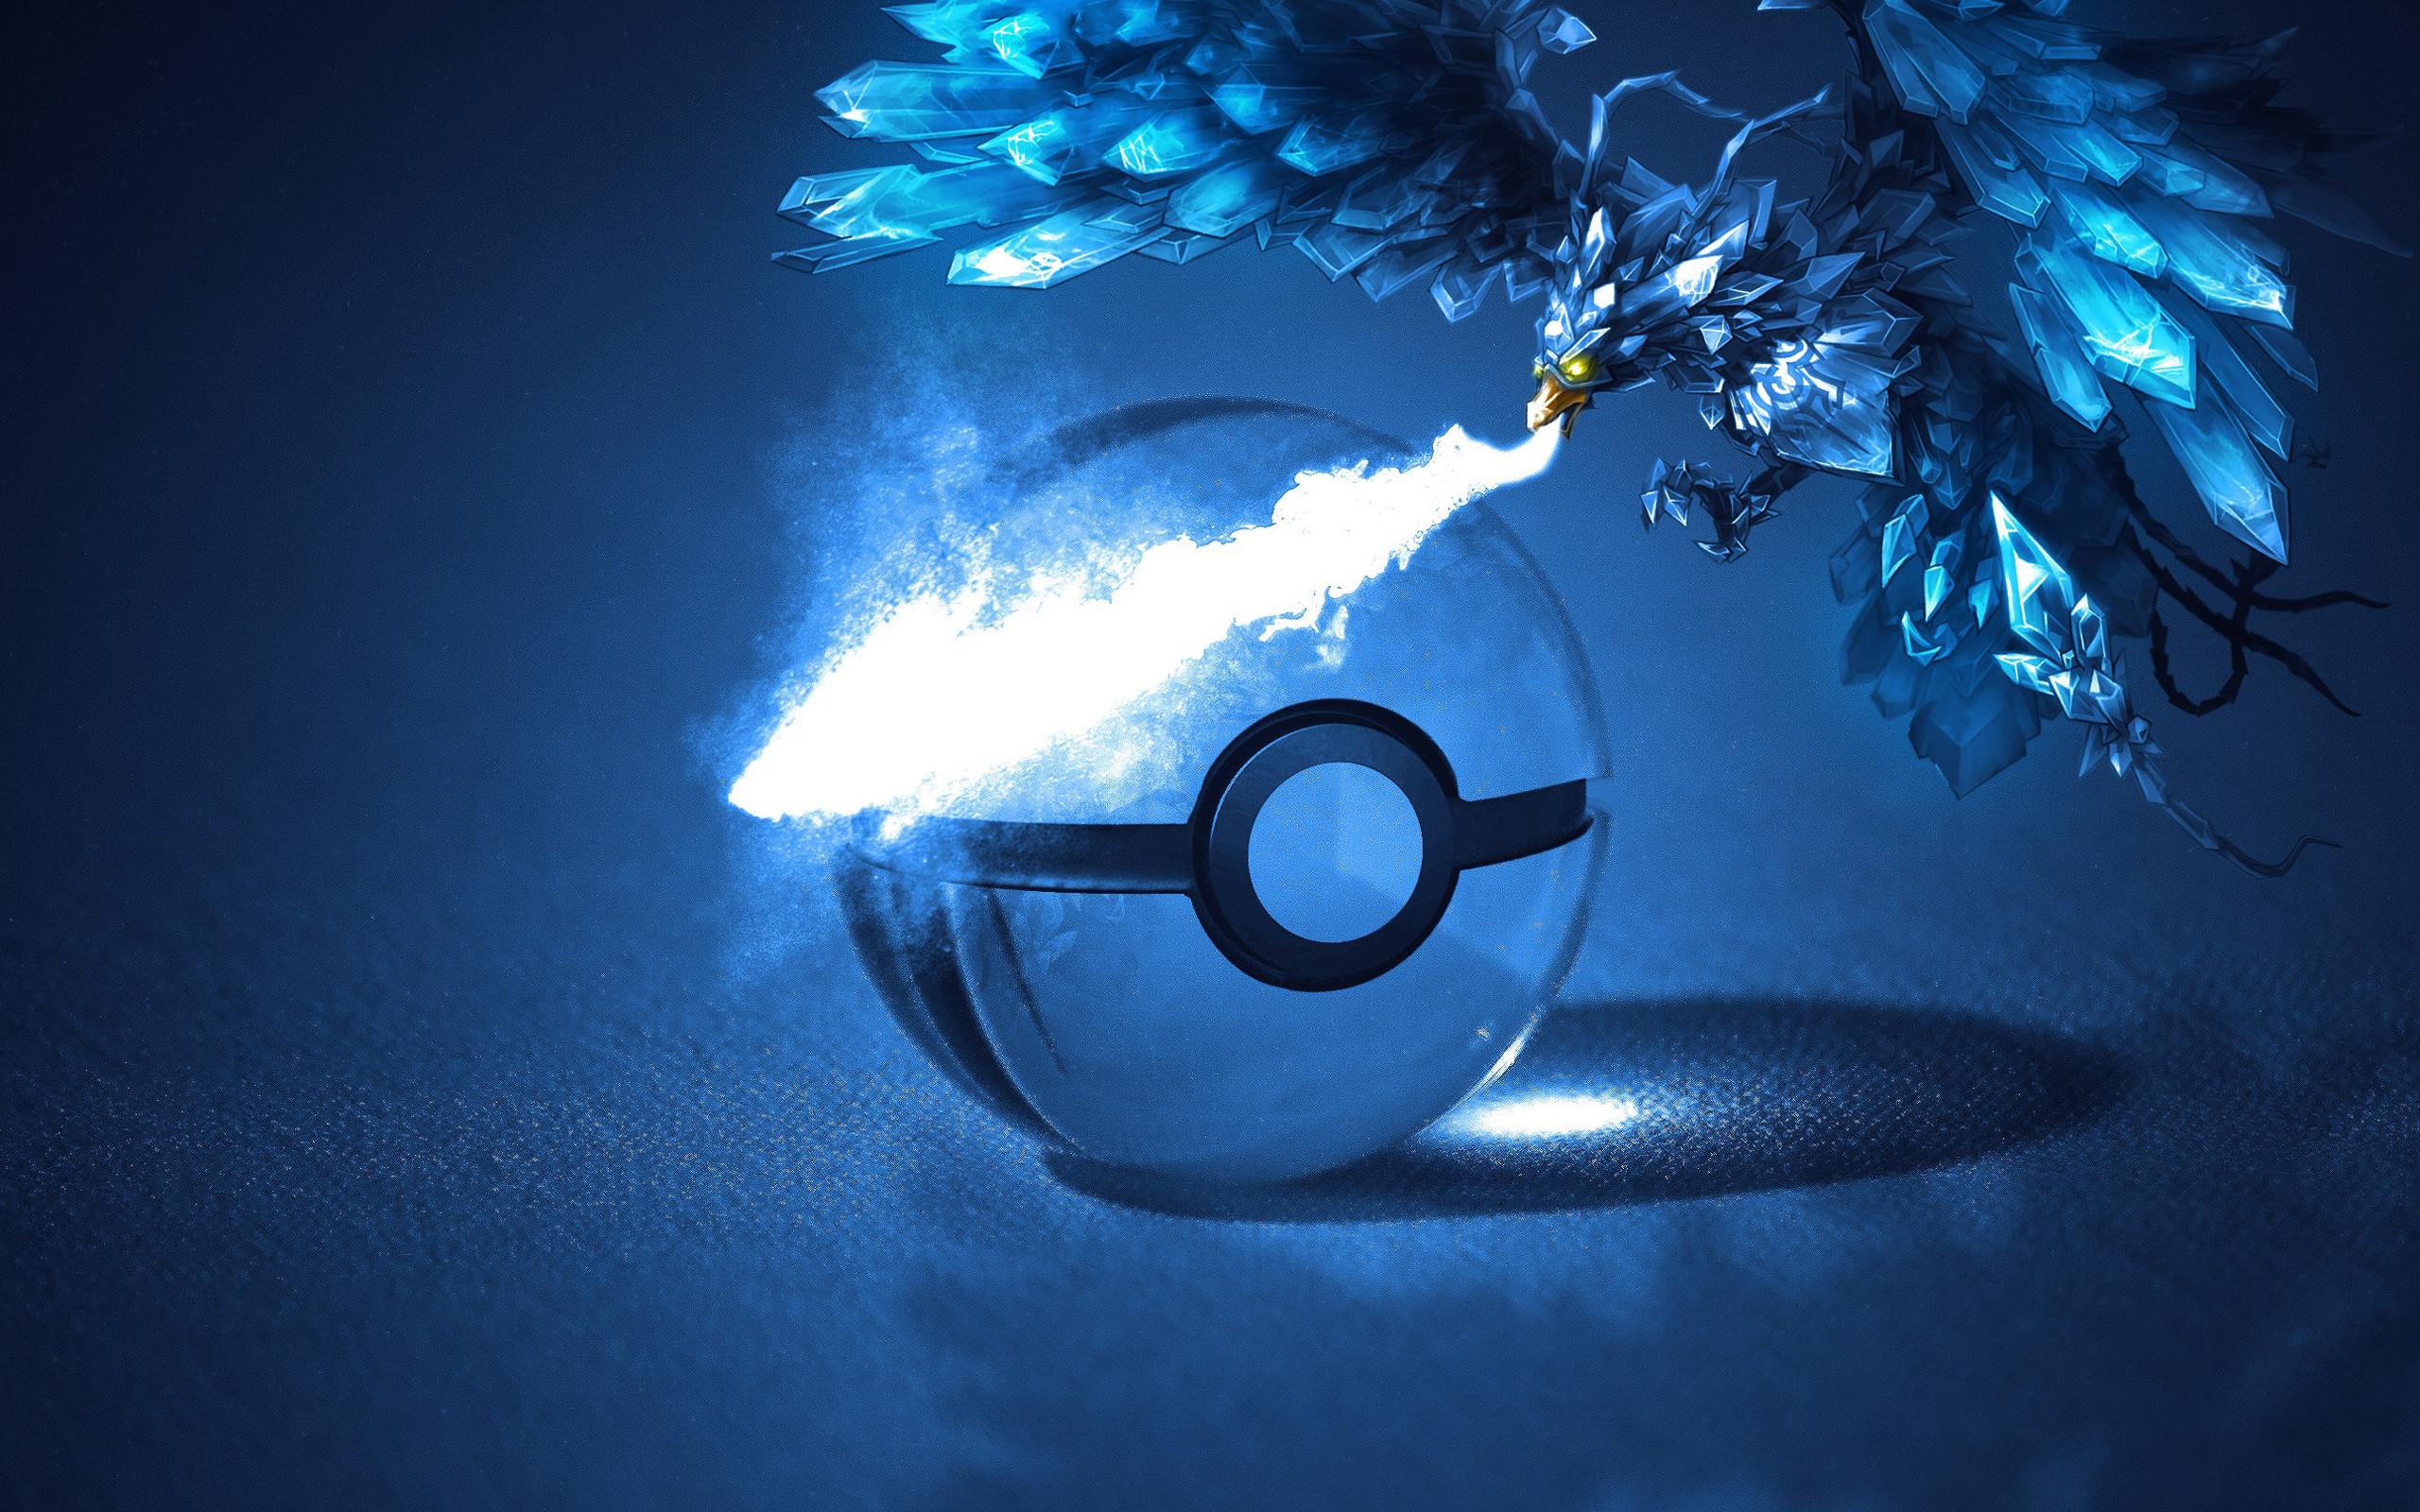 Res: 2560x1600, Pokemon 3D Wallpaper, FHDQ Backgrounds, Delinda Jager